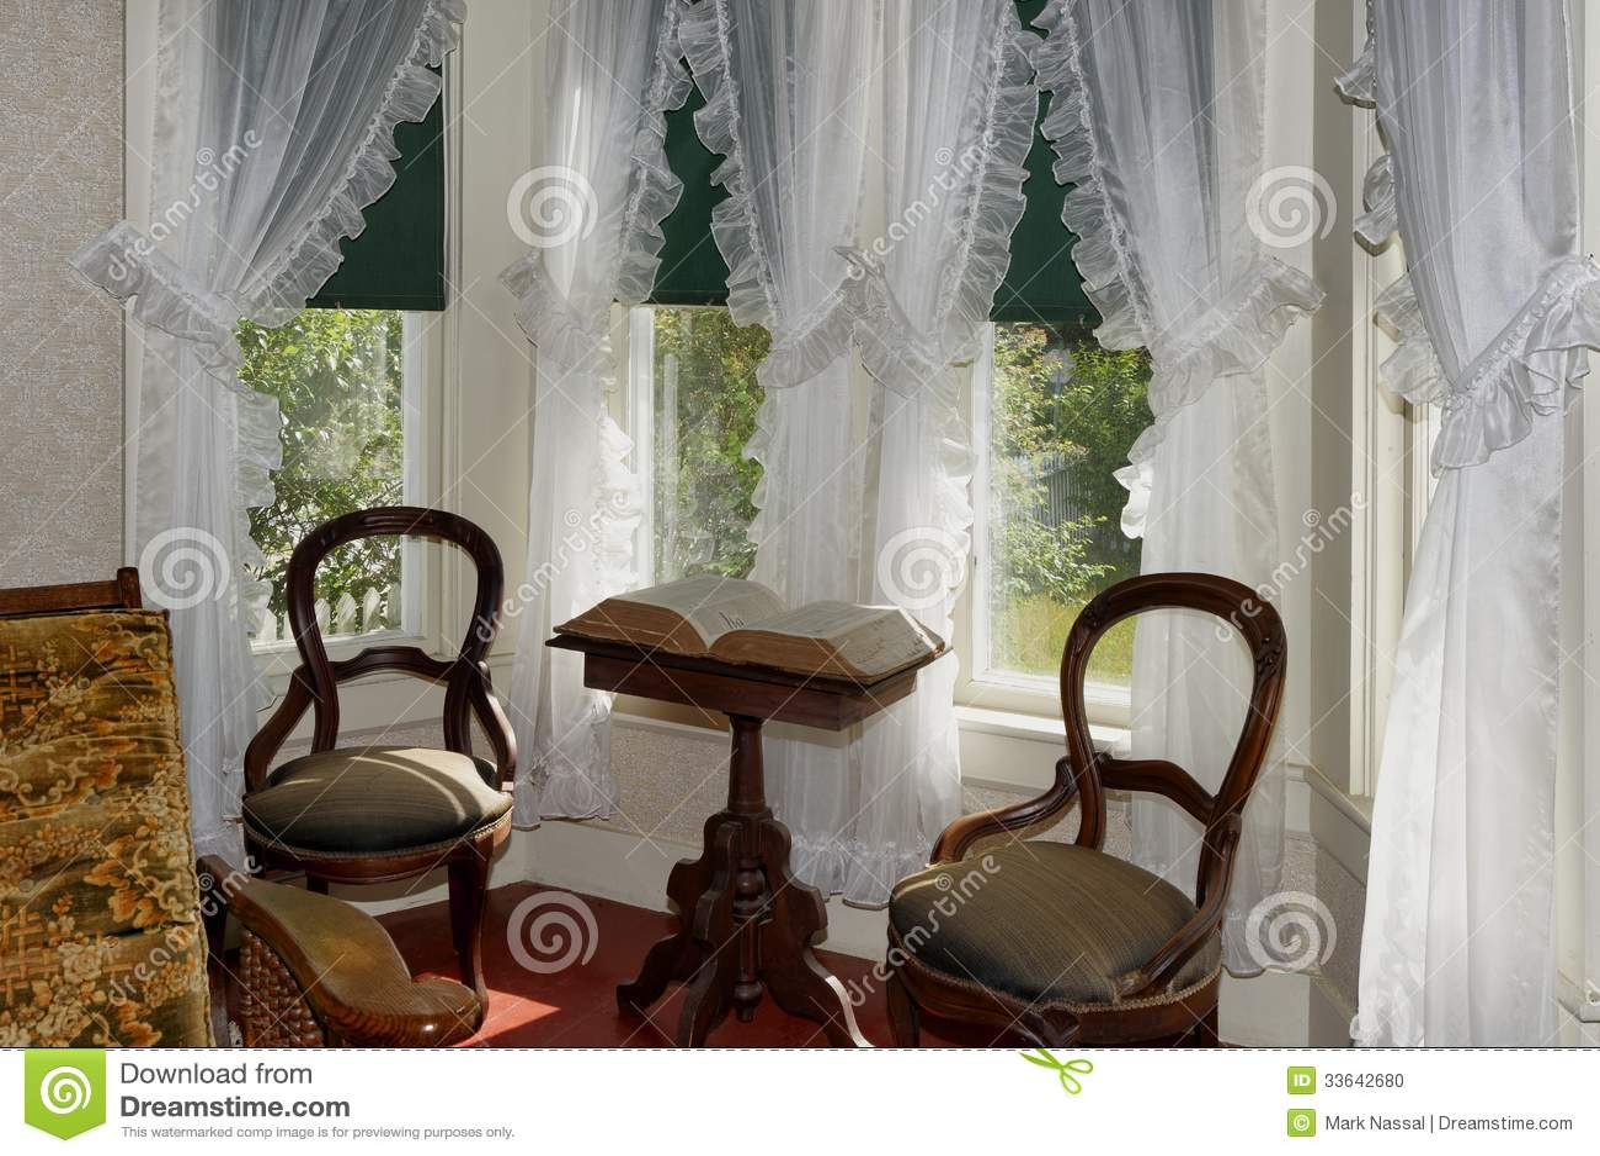 Sunny Sitting Room Editorial Image - Image: 33642680